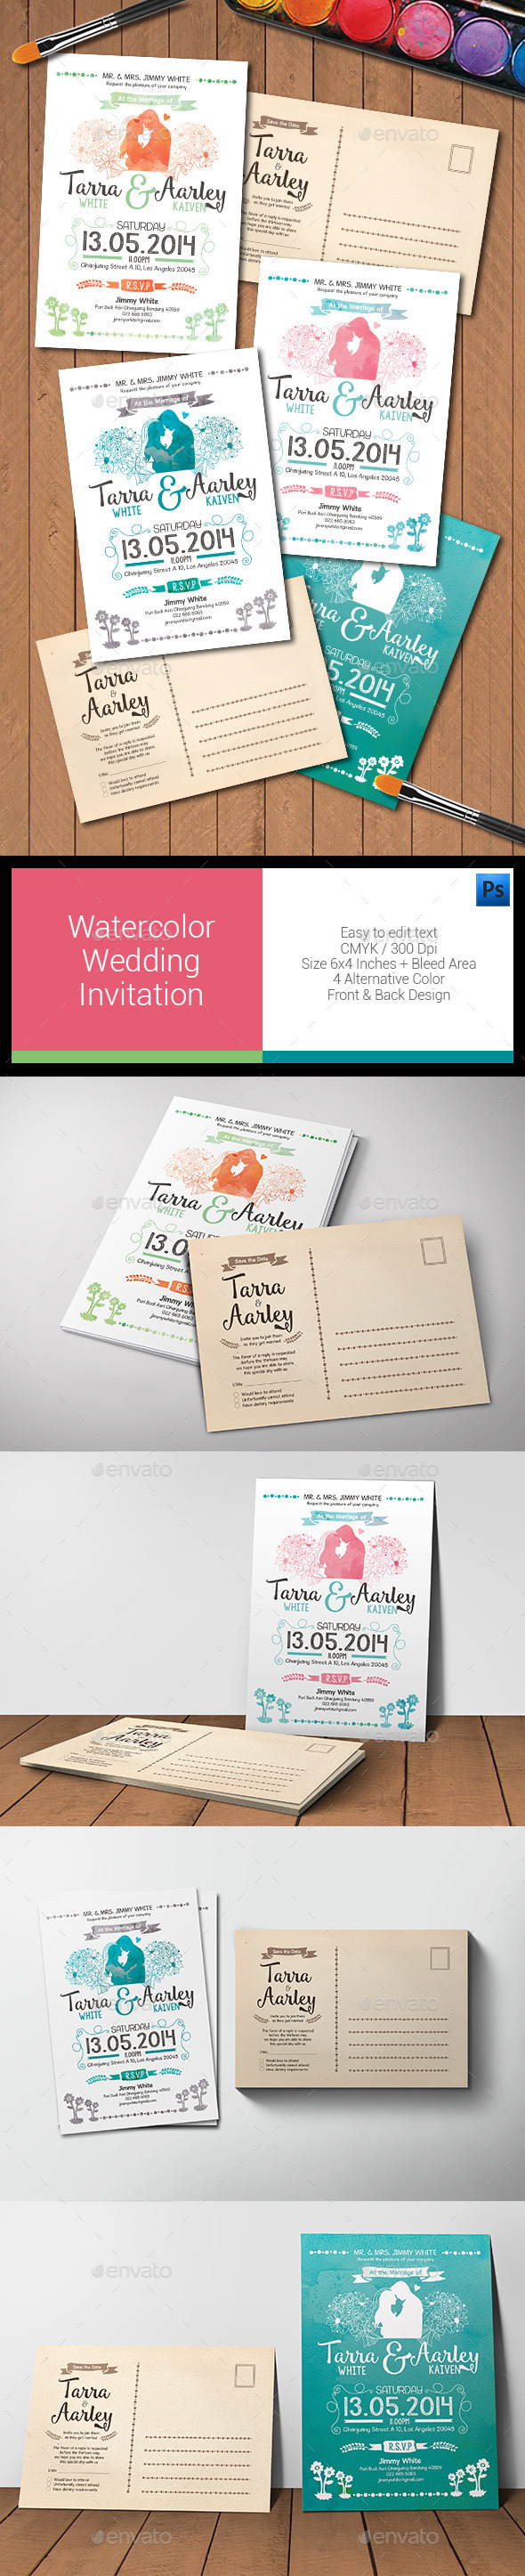 Watercolor Post Card Wedding Invitation - Weddings Cards & Invites